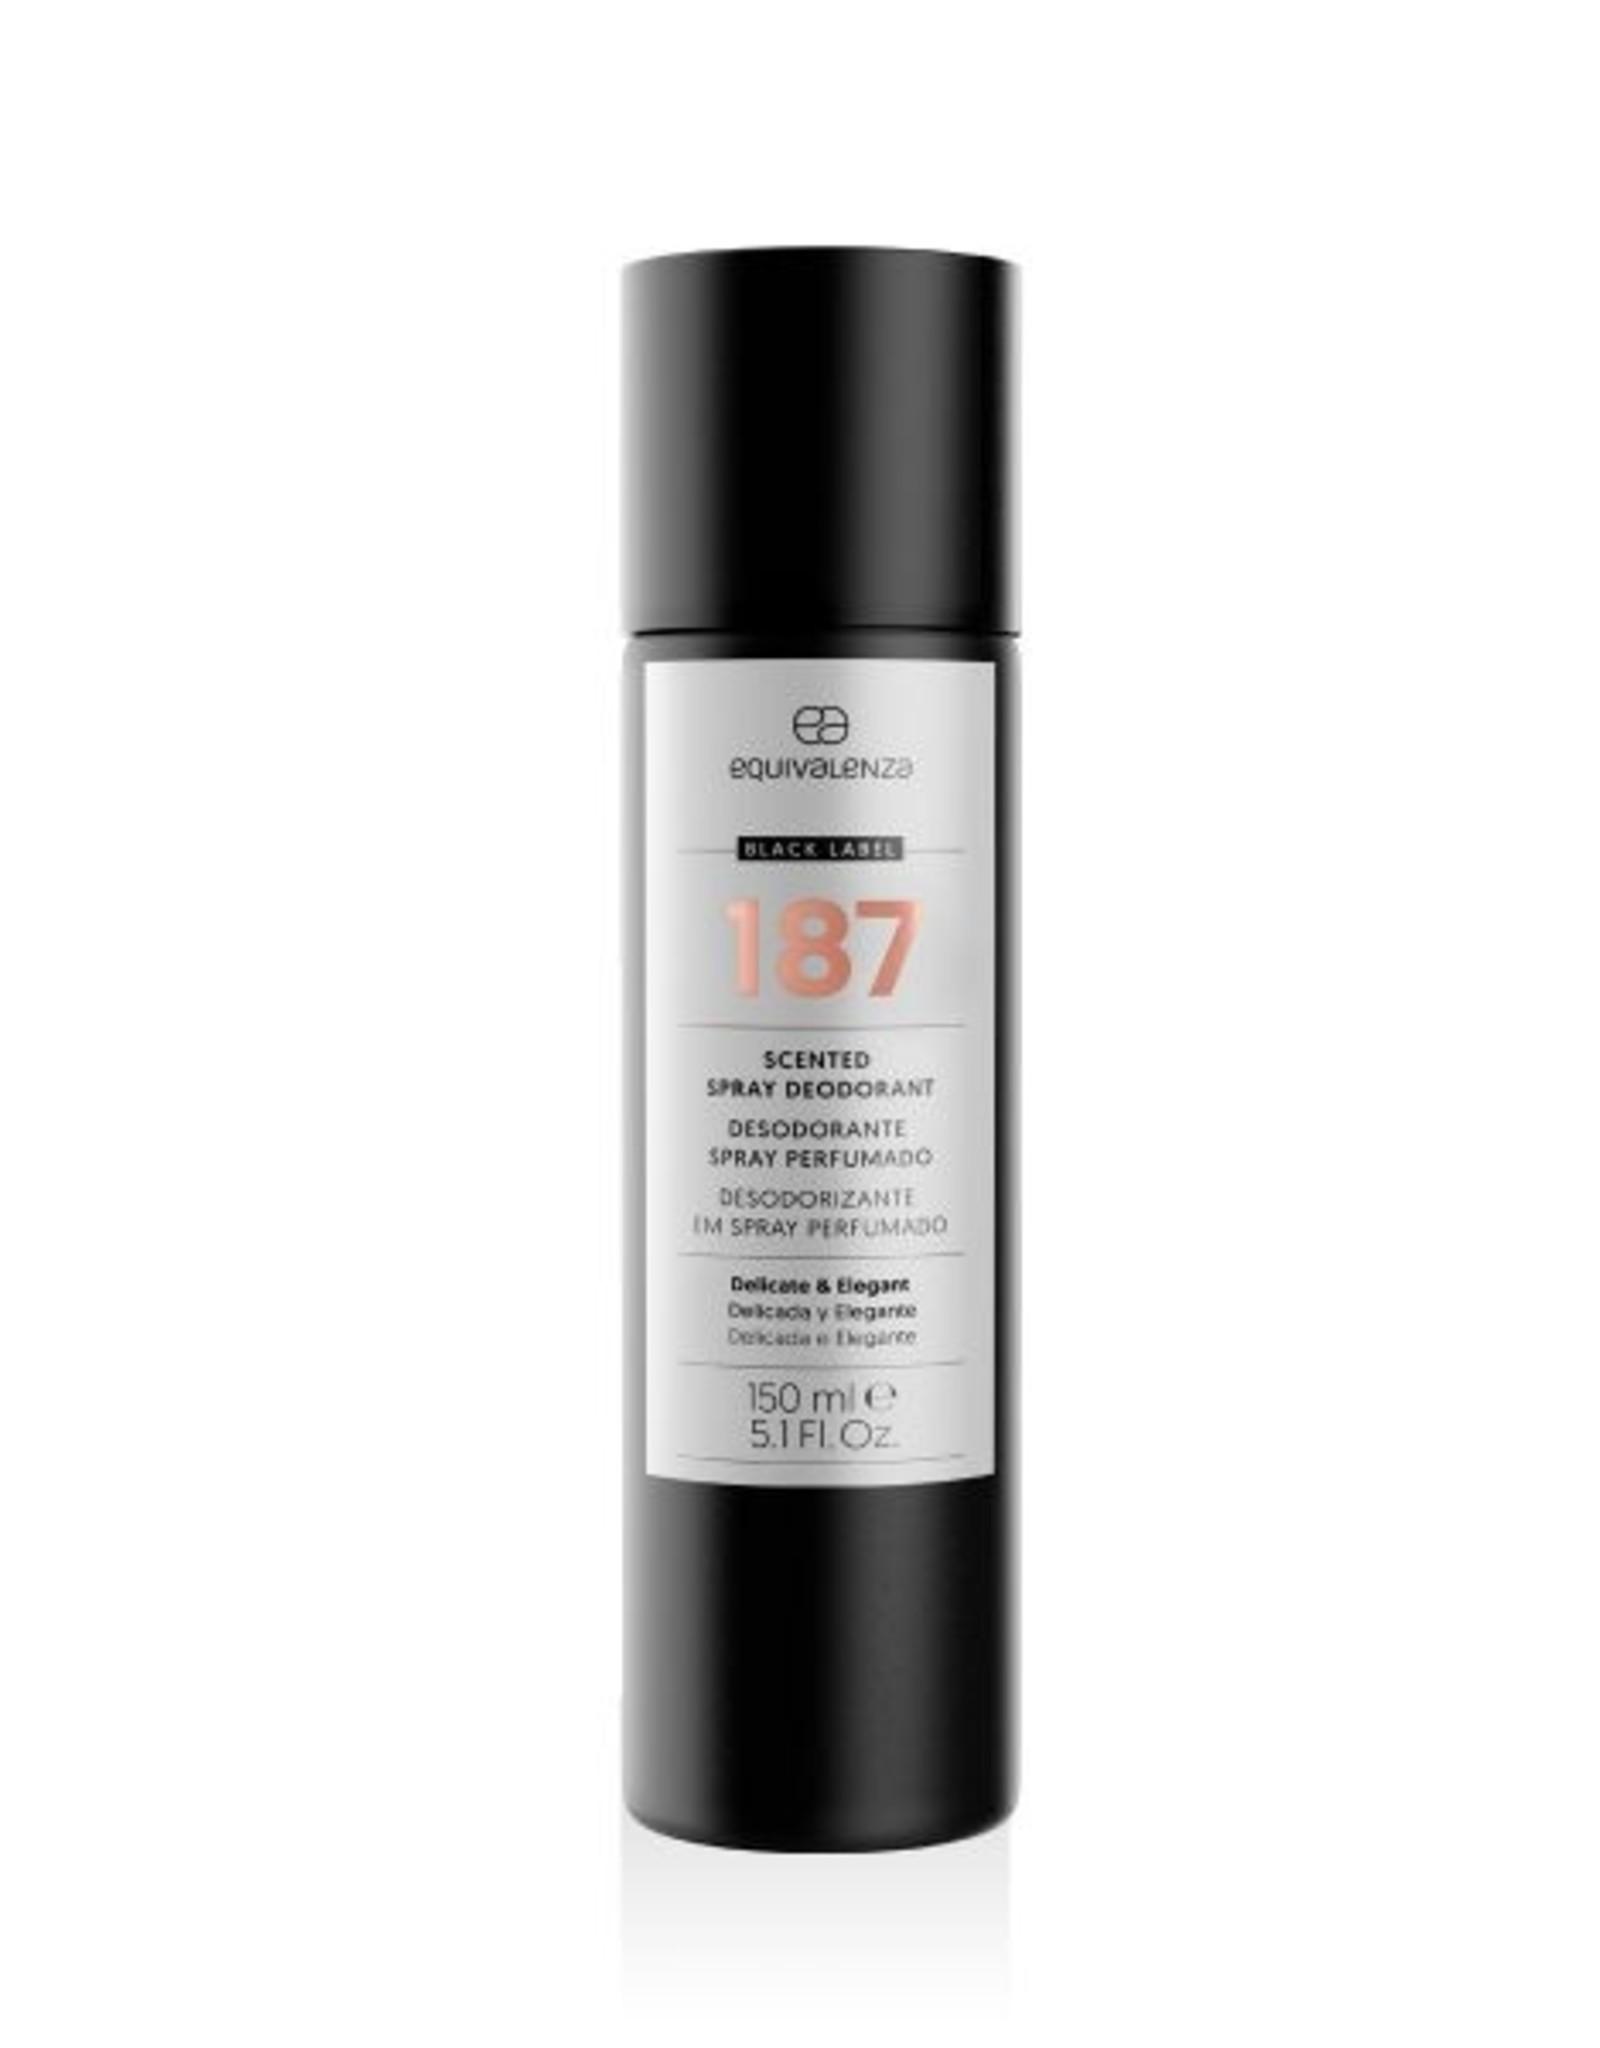 Equivalenza Black Label Deodorant 187